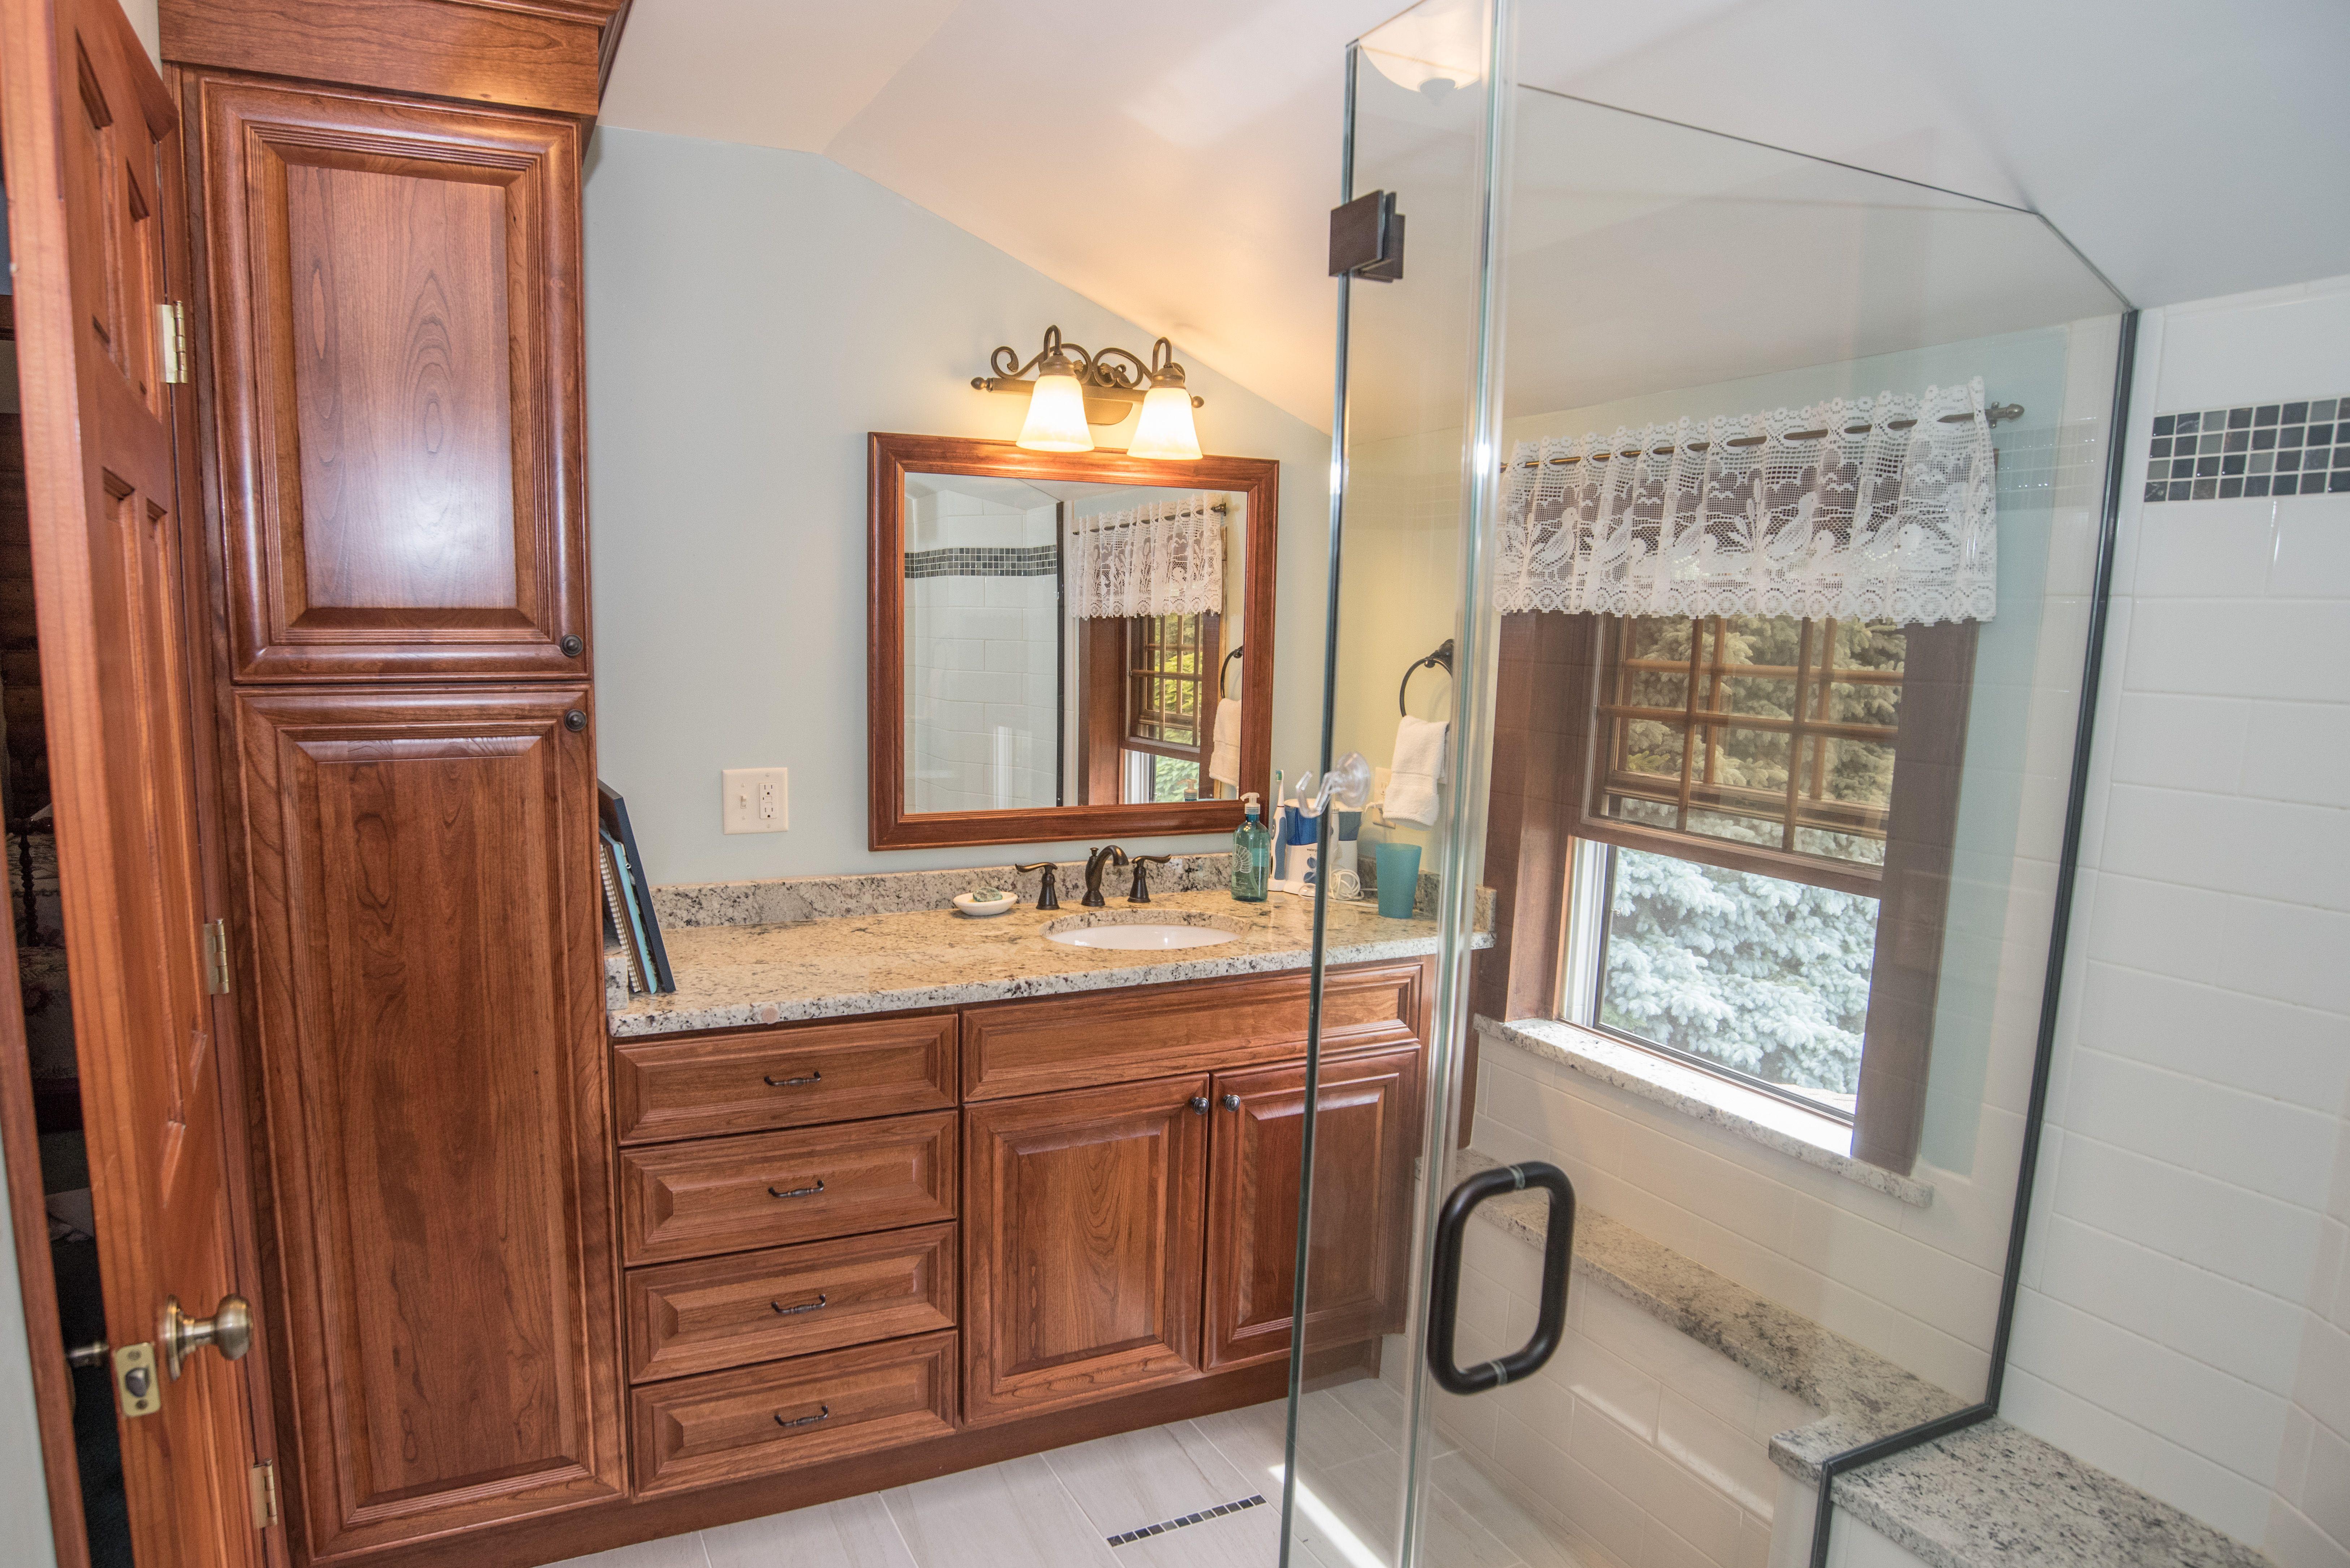 Master Bathroom, Grand Island Ny. Haas Monticello Cherry Cinnamon